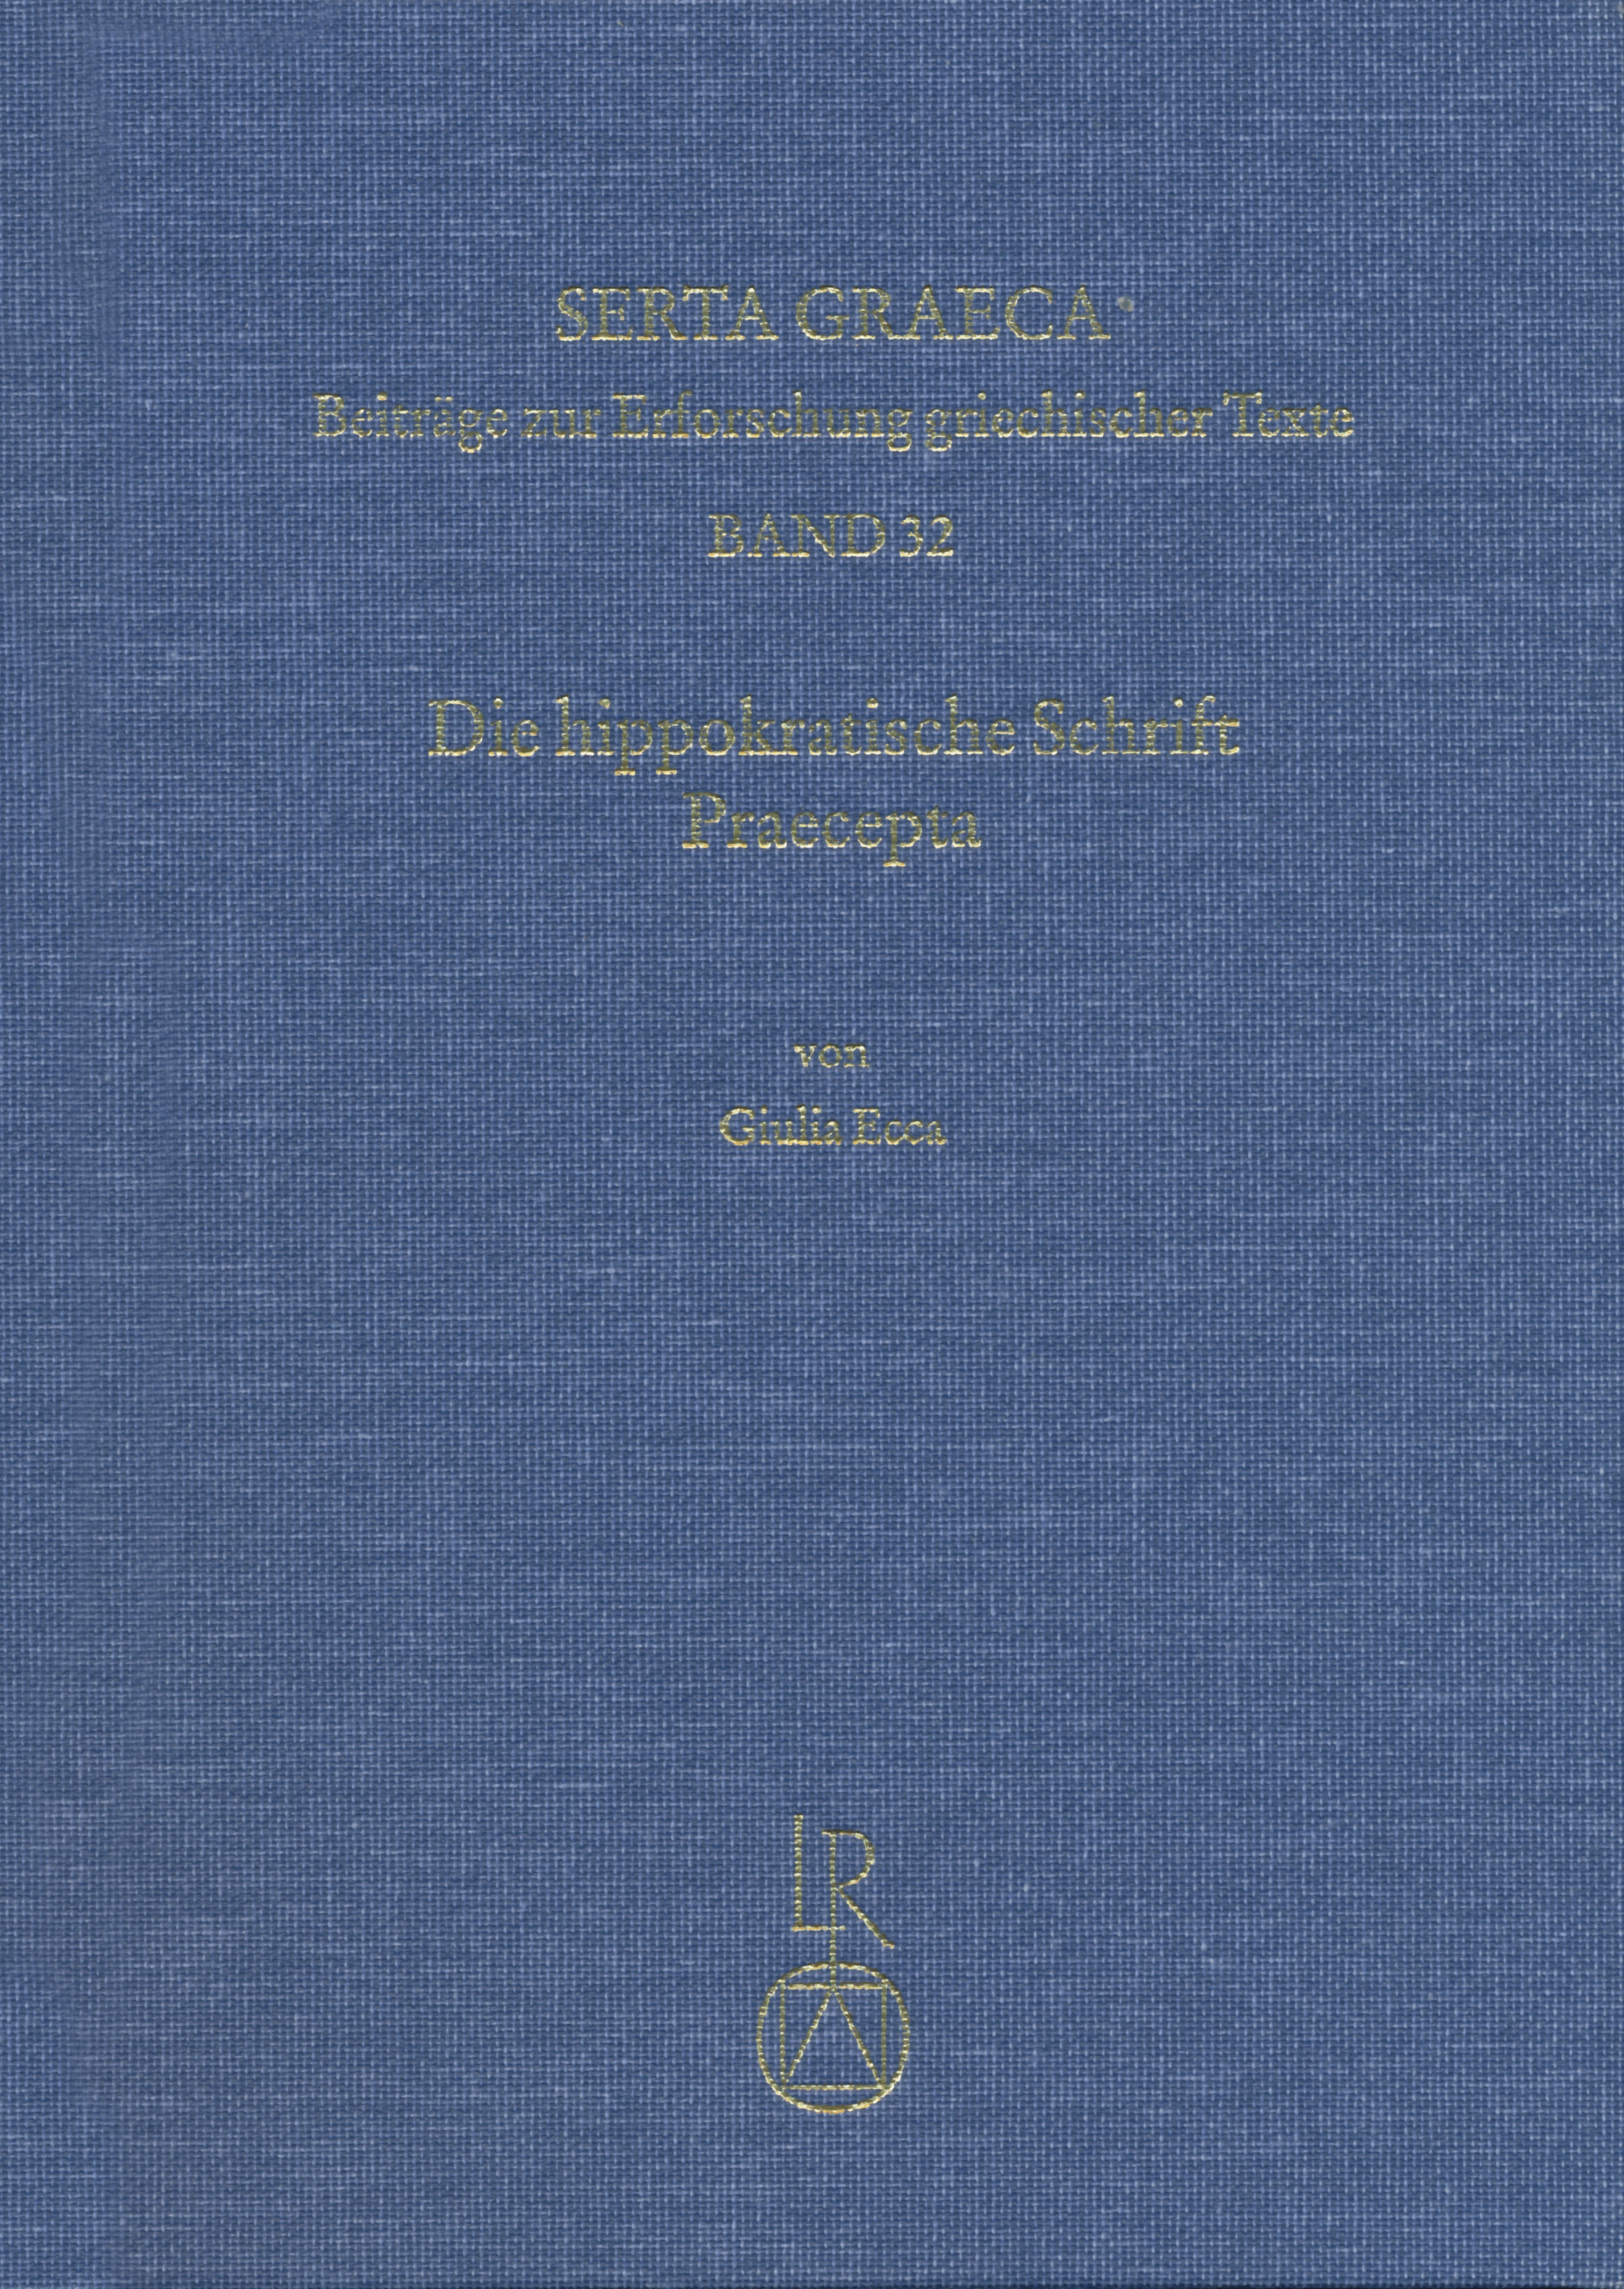 Die hippokratische Schrift Praecepta | Giulia Ecca |  9783954901548